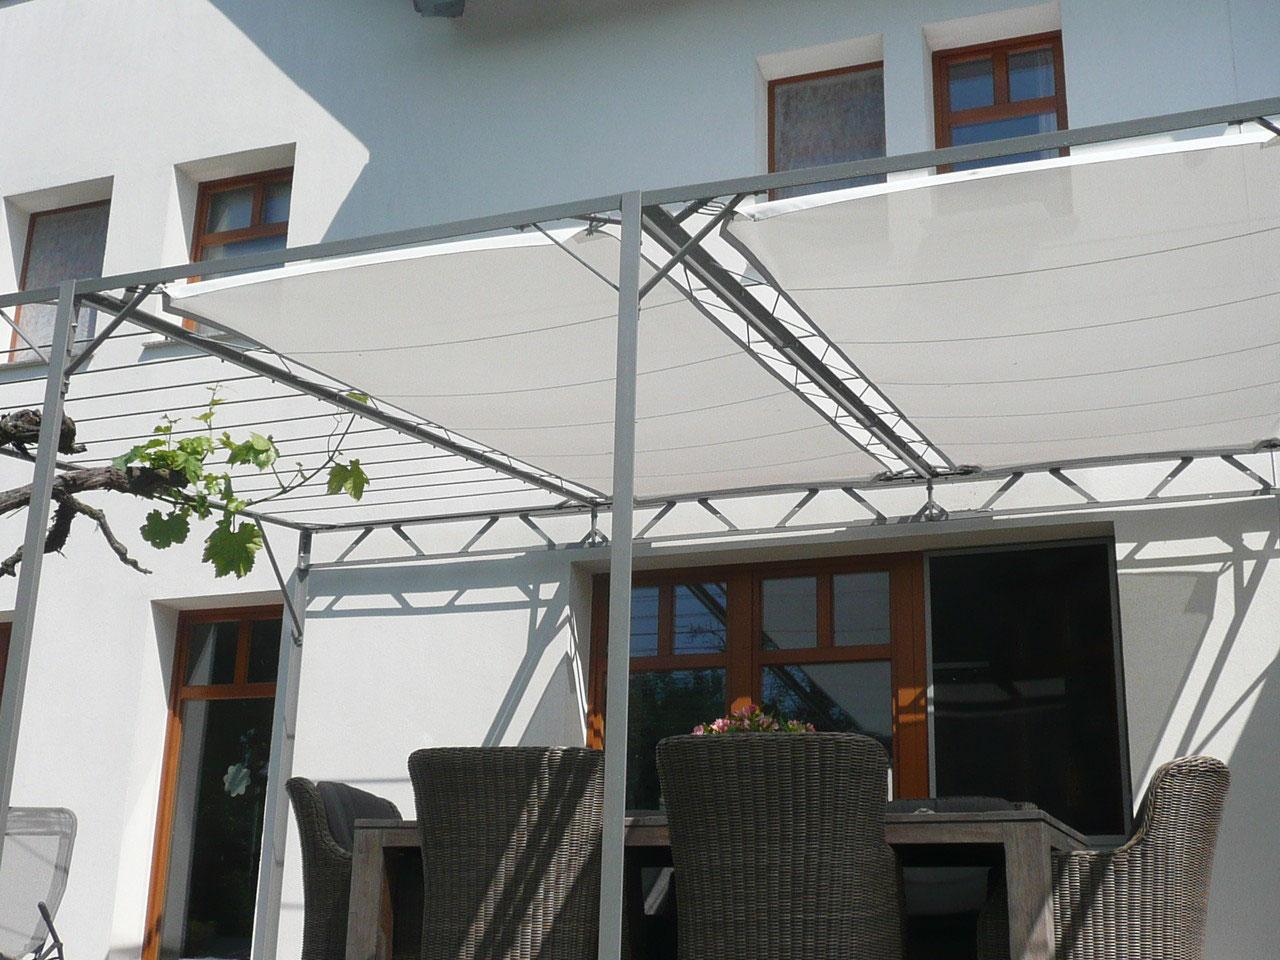 innovative kundenl sungen sonnensegel die ideale beschattung. Black Bedroom Furniture Sets. Home Design Ideas